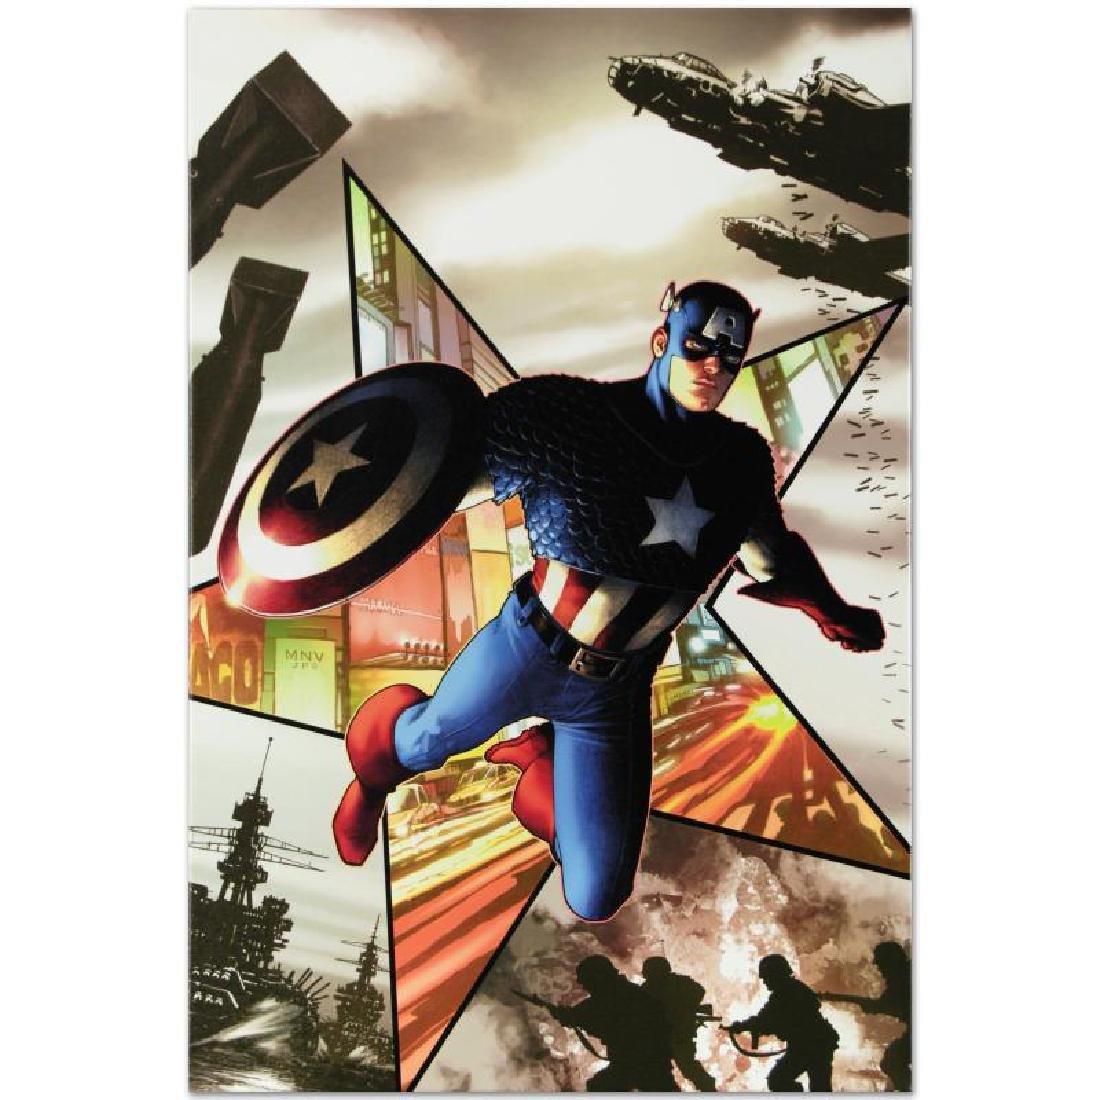 Captain America #1 by Marvel Comics - 3